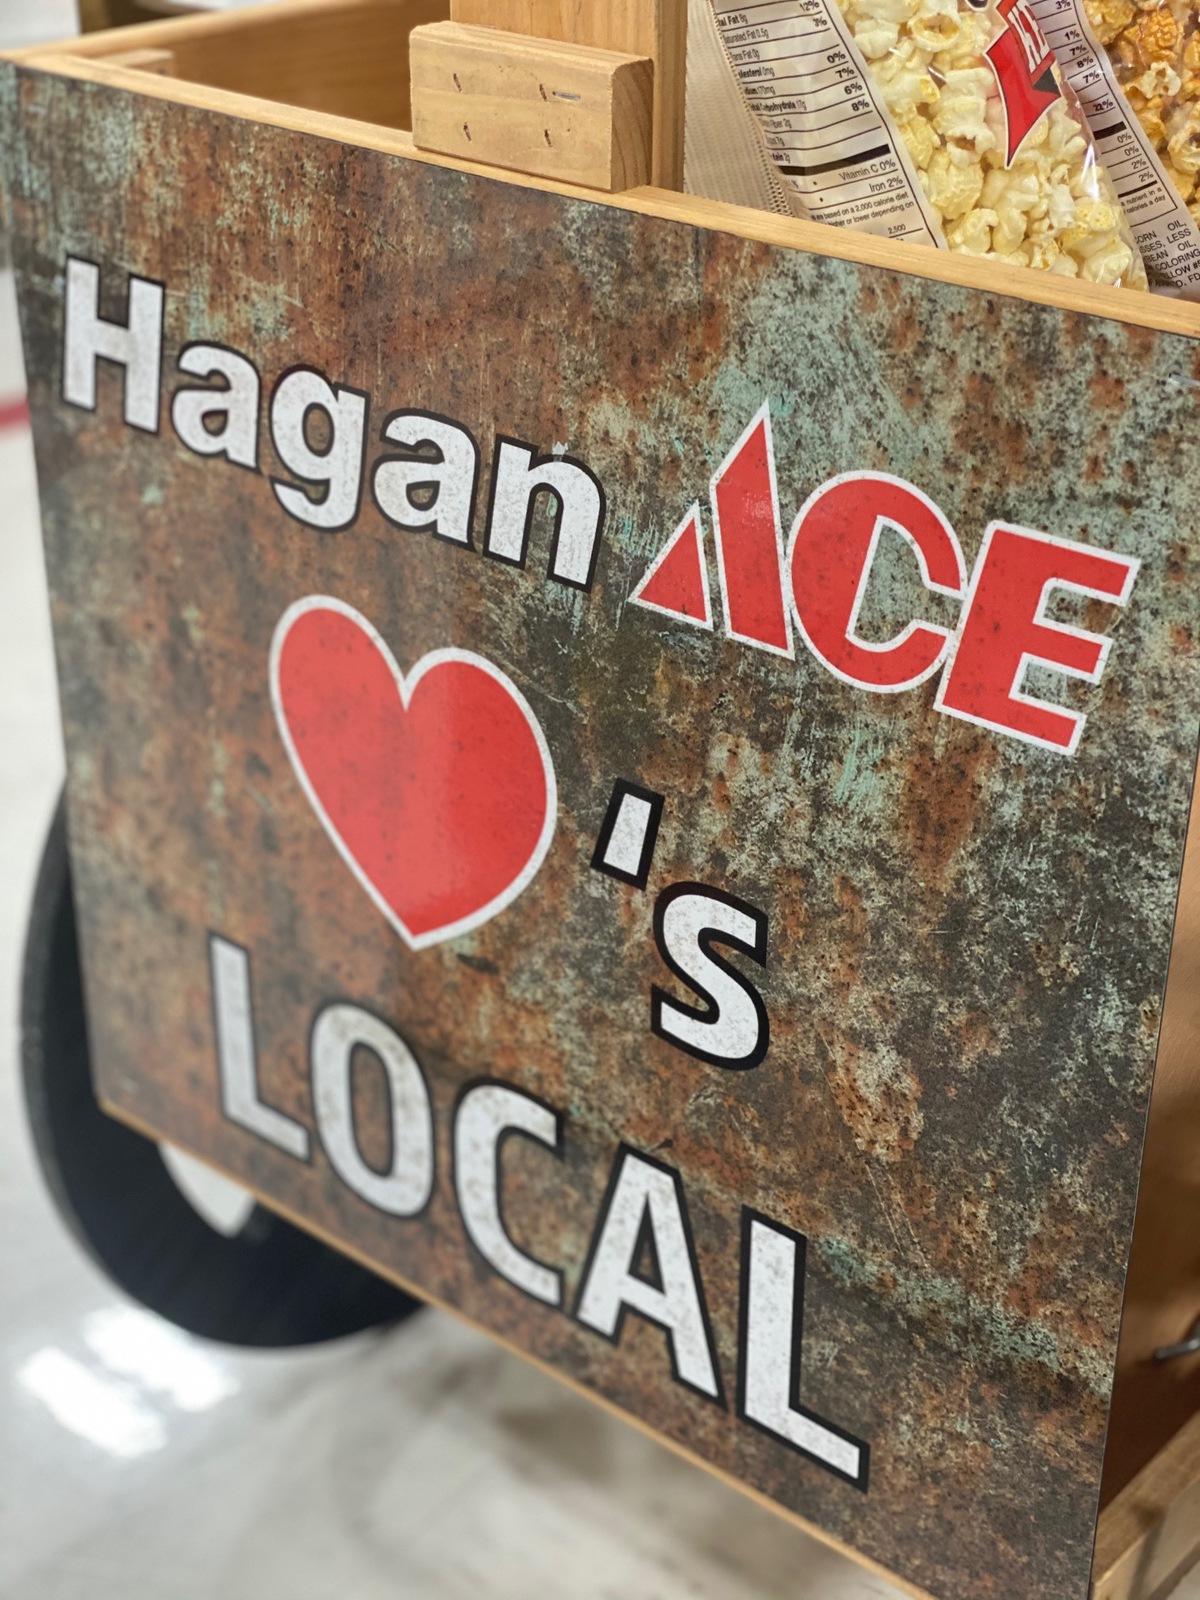 Hagan ace loves local cart 1